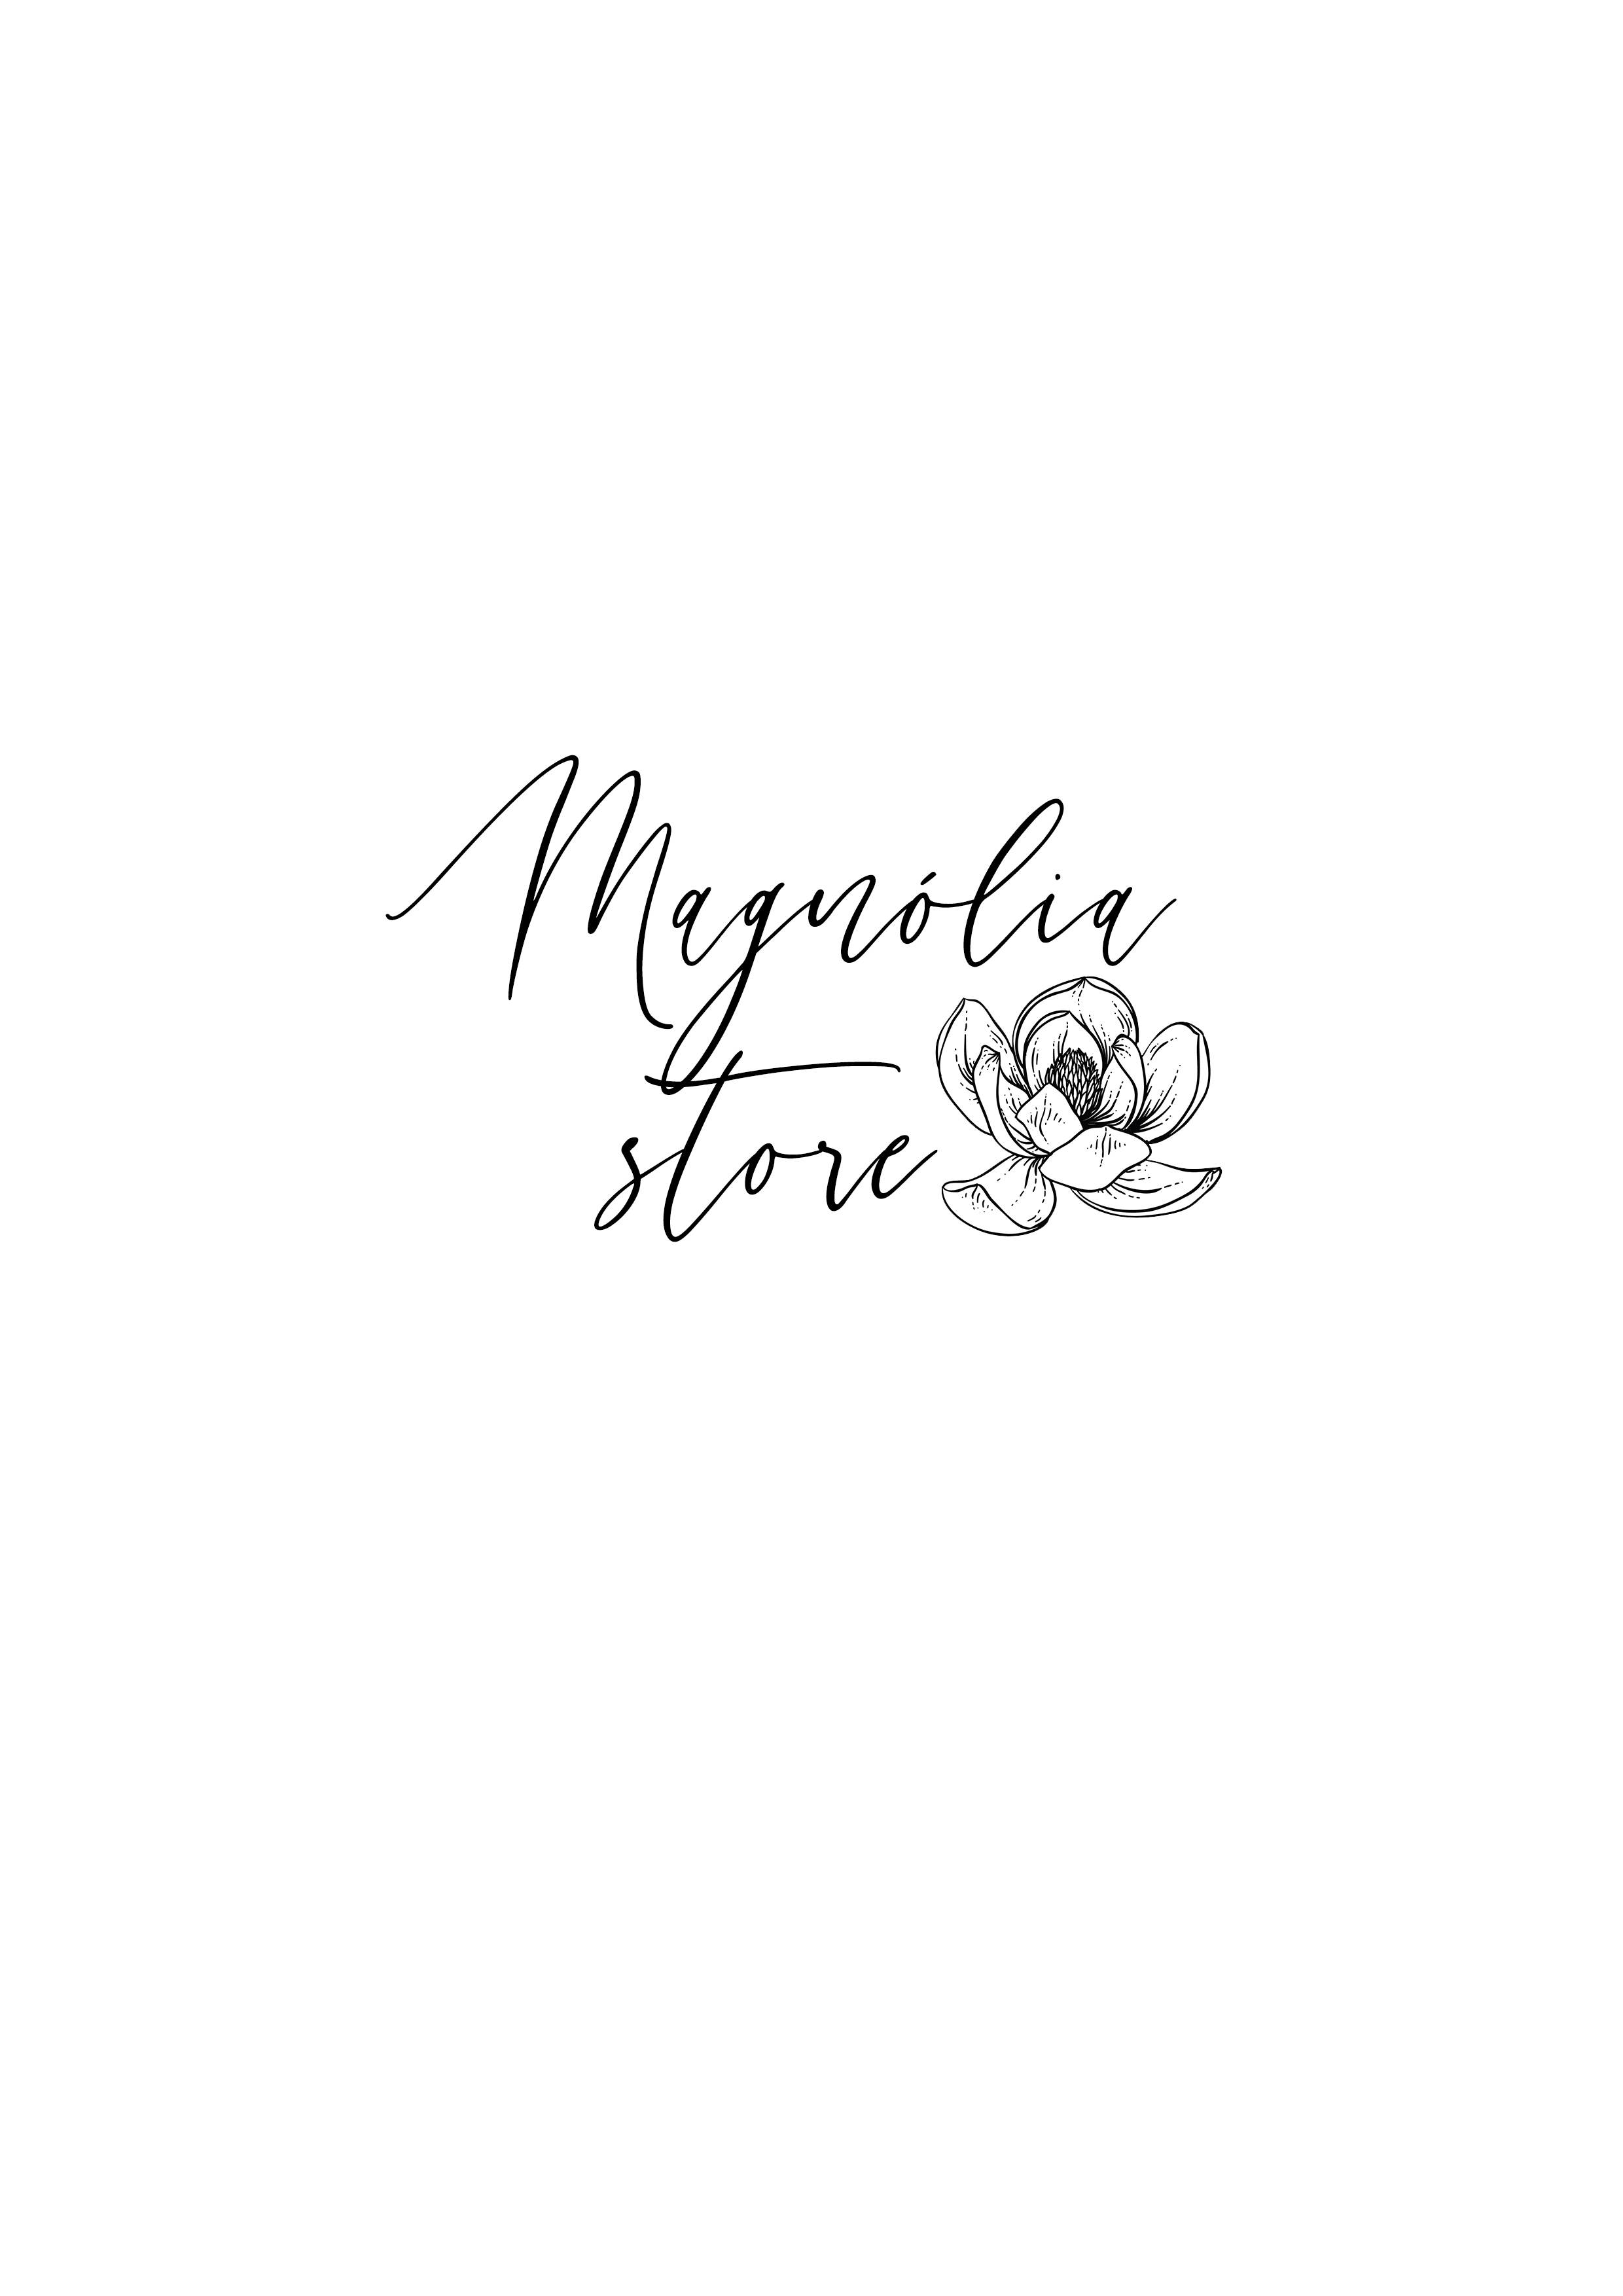 Logomarca Magnólia Store